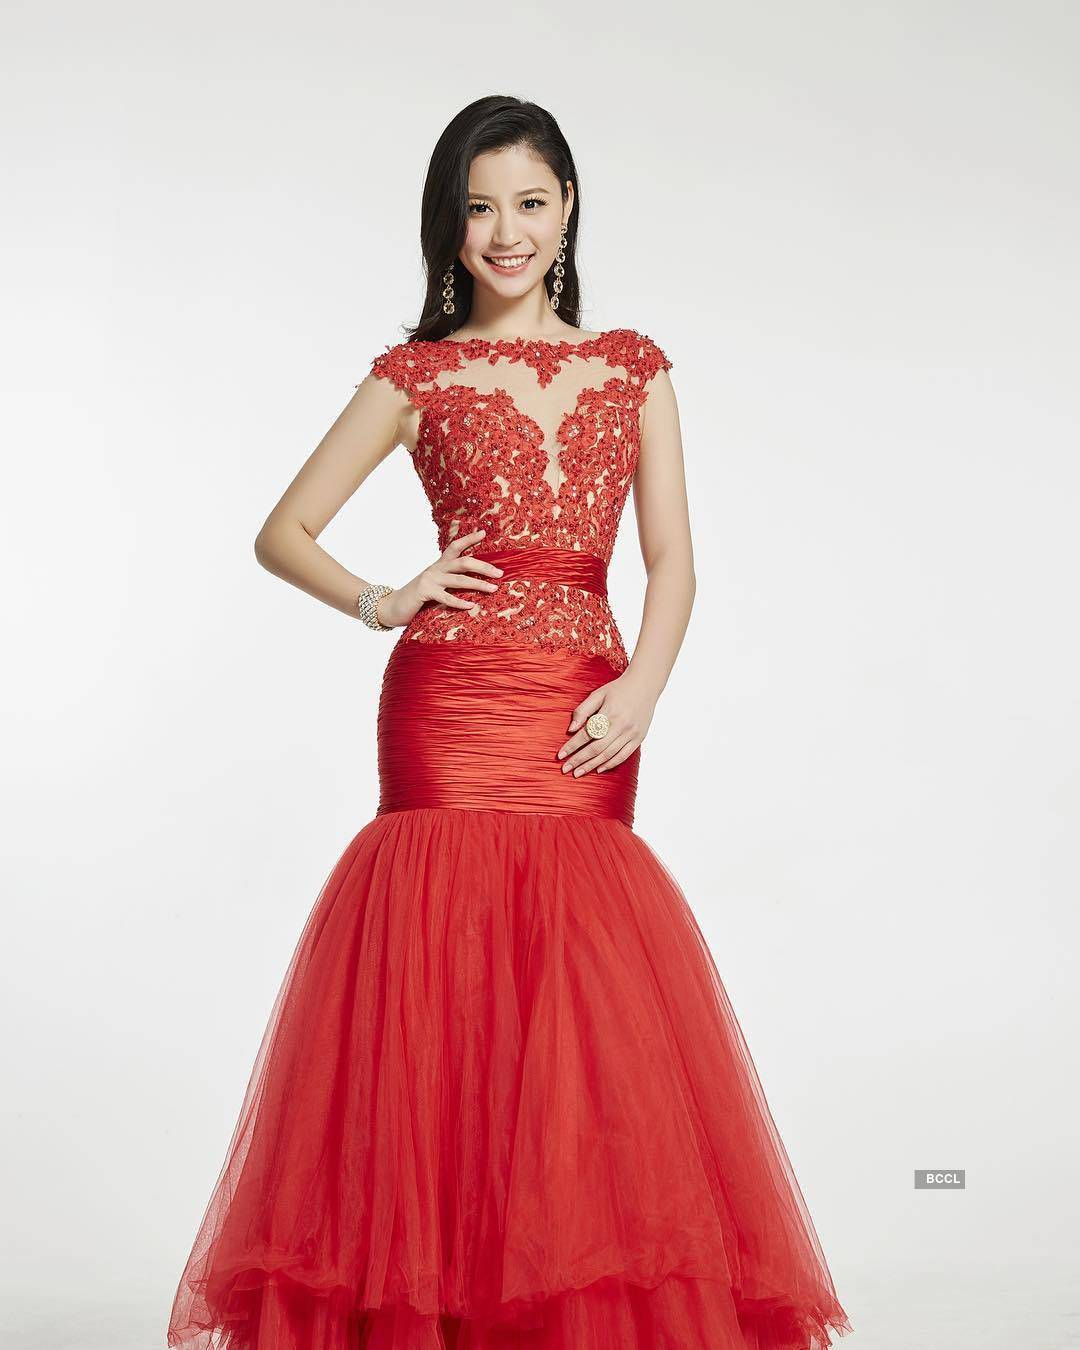 Meisu Qin crowned Miss Universe China 2018